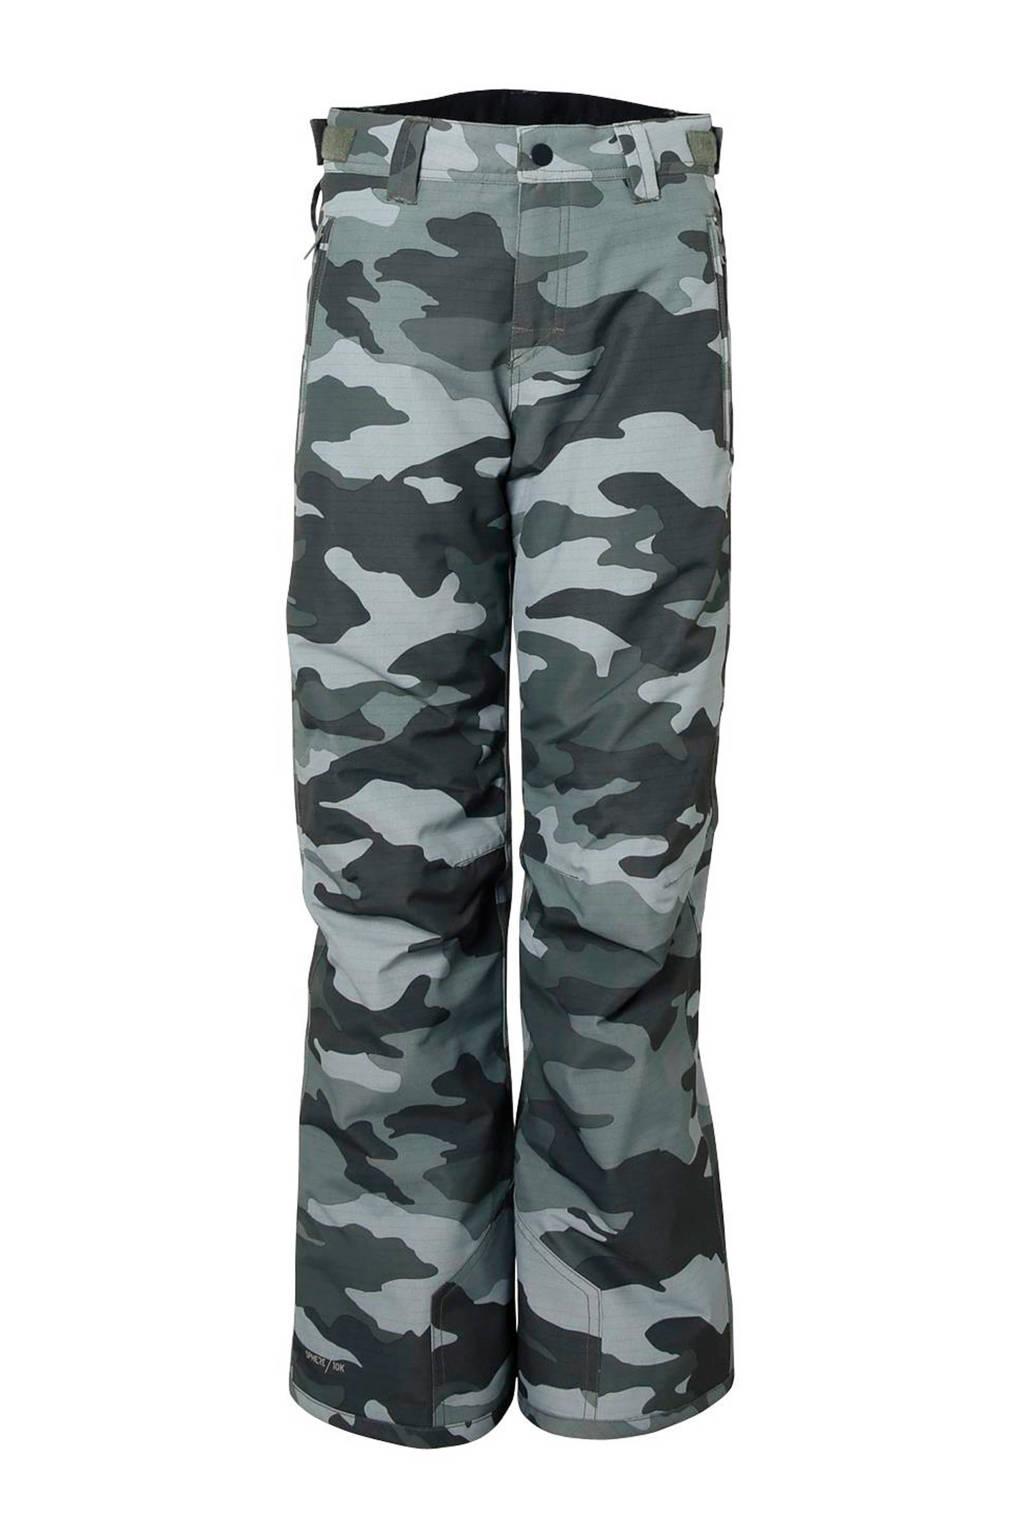 Brunotti skibroek Kitebar groen camouflage, Groen/wit/grijs